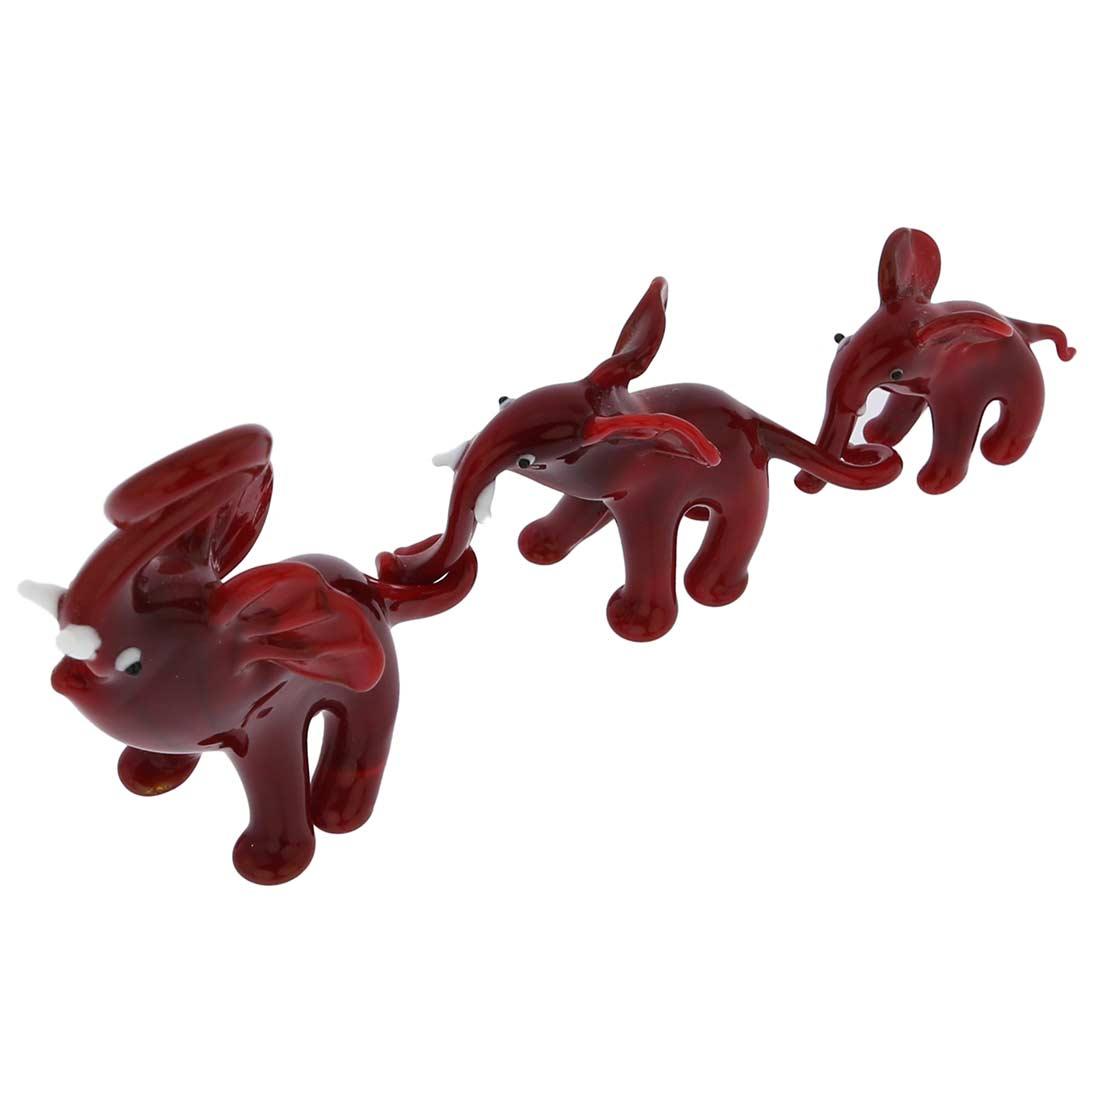 Murano Glass Elephant Family - Red